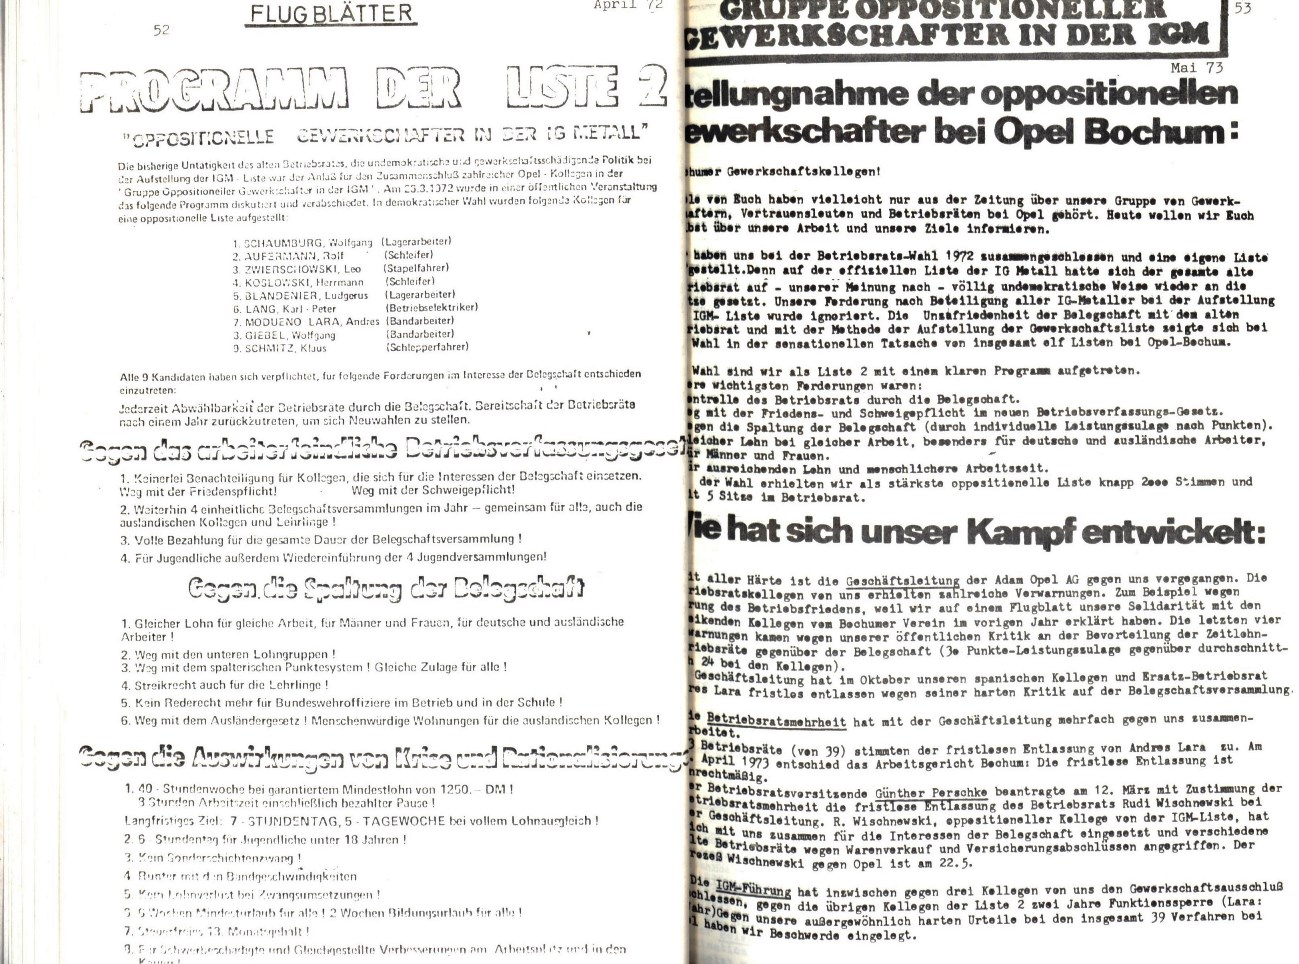 Bochum_IGM_Opel_PG_Opel_streikt_1973_028